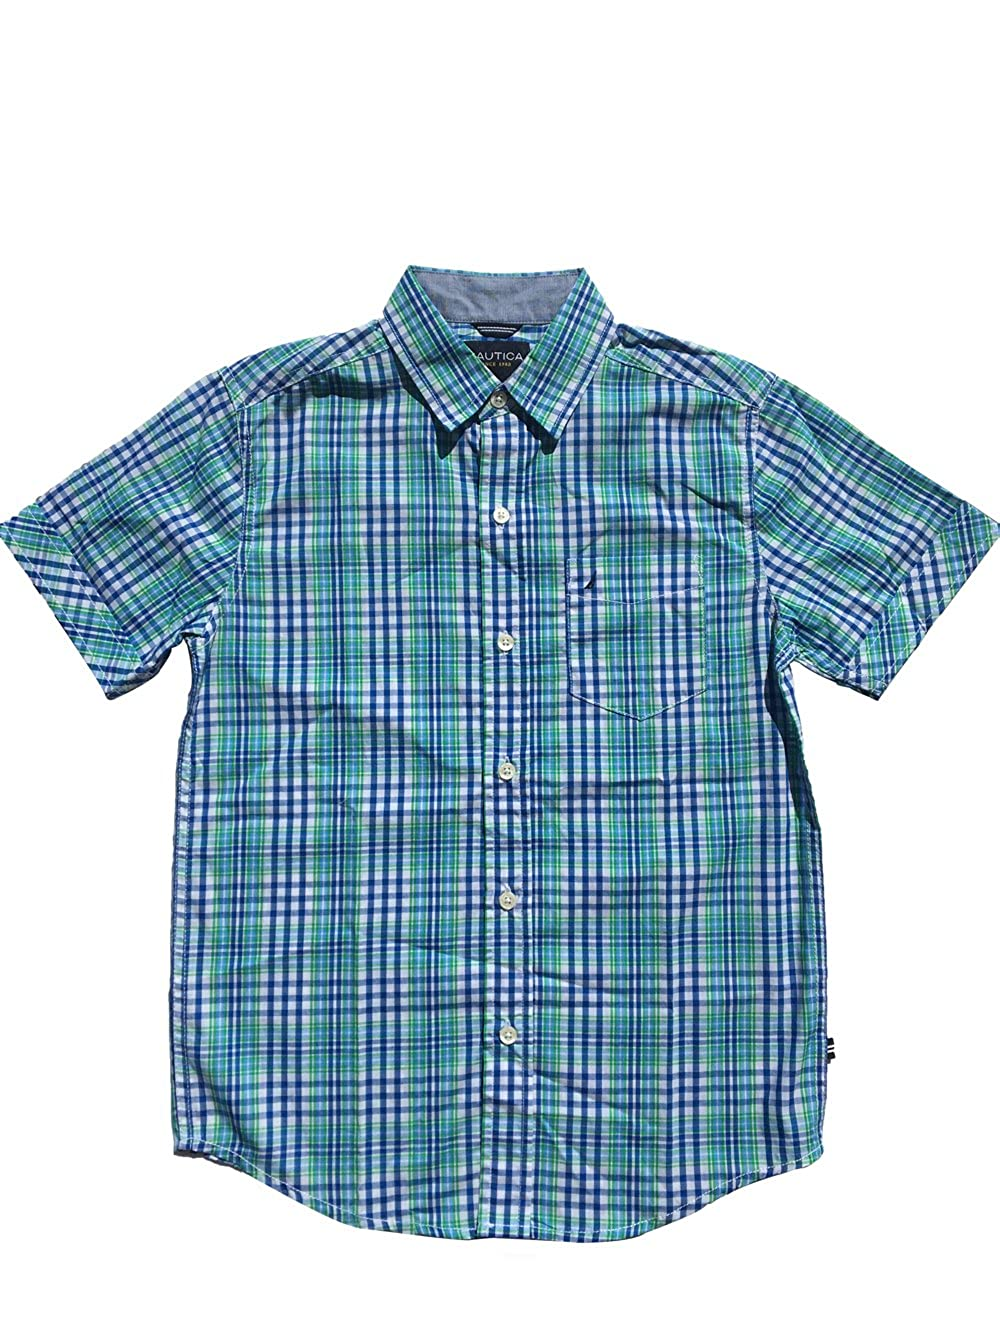 Azure Blue Nautica Big Boys Button Up Plaid Short Sleeve Shirt